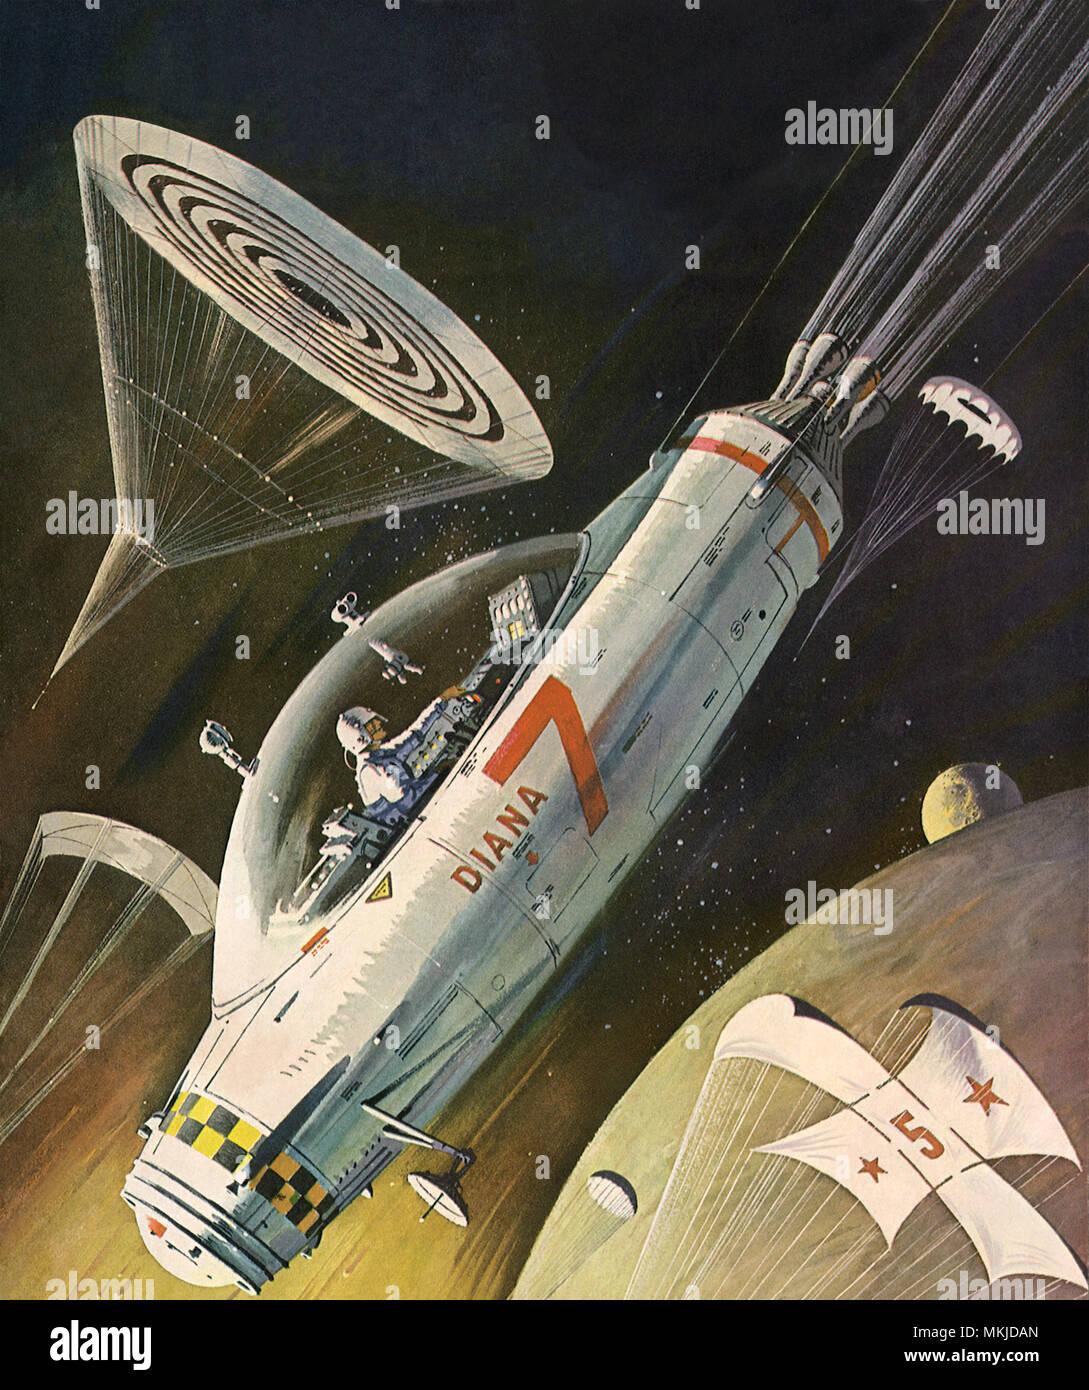 Sci Fi - Spaceship - Stock Image